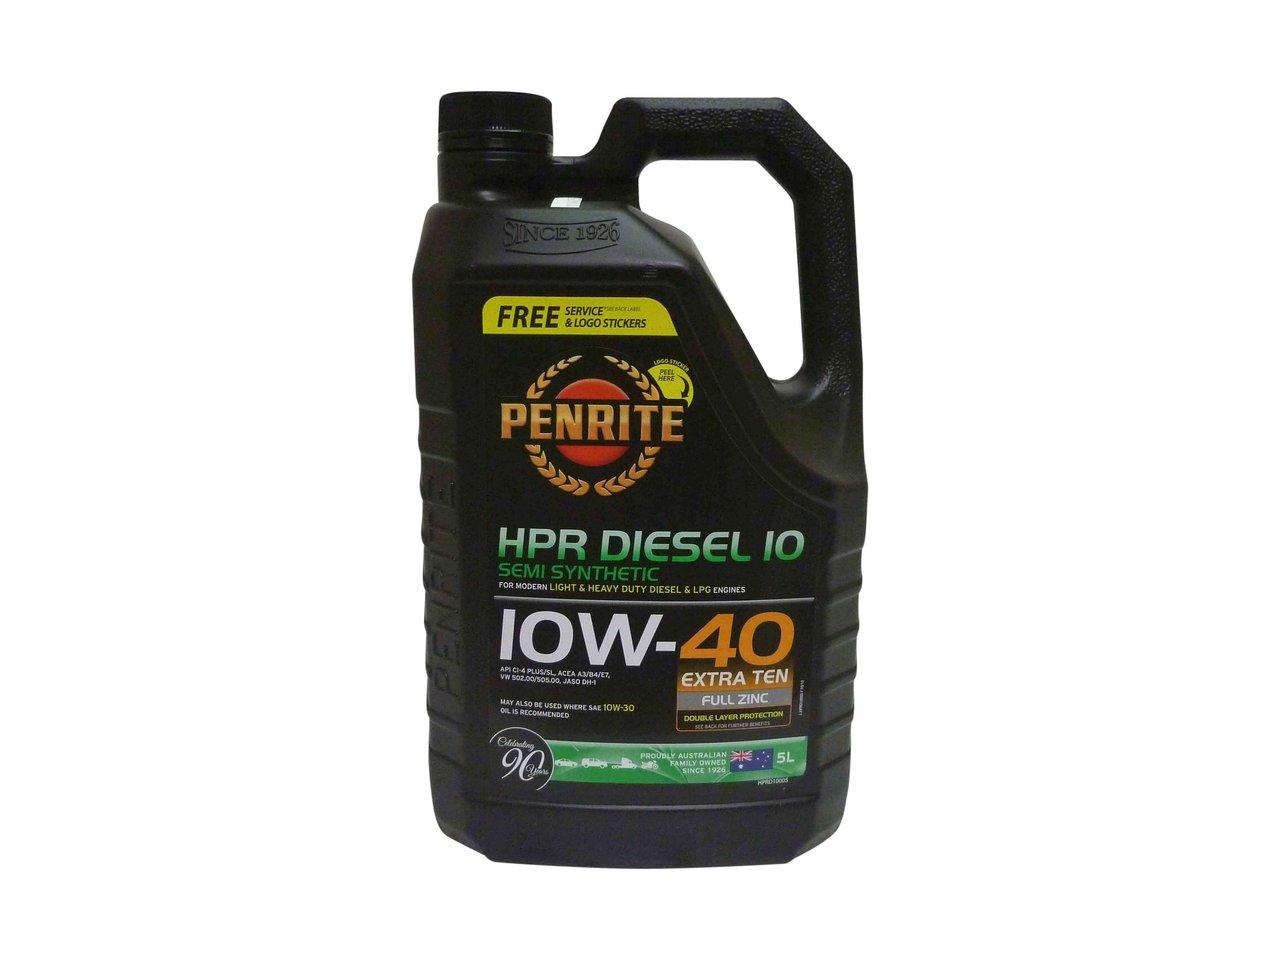 Penrite hpr diesel 10 semi synthetic engine oil 10w 40 5l for Synthetic motor oil for diesel engines